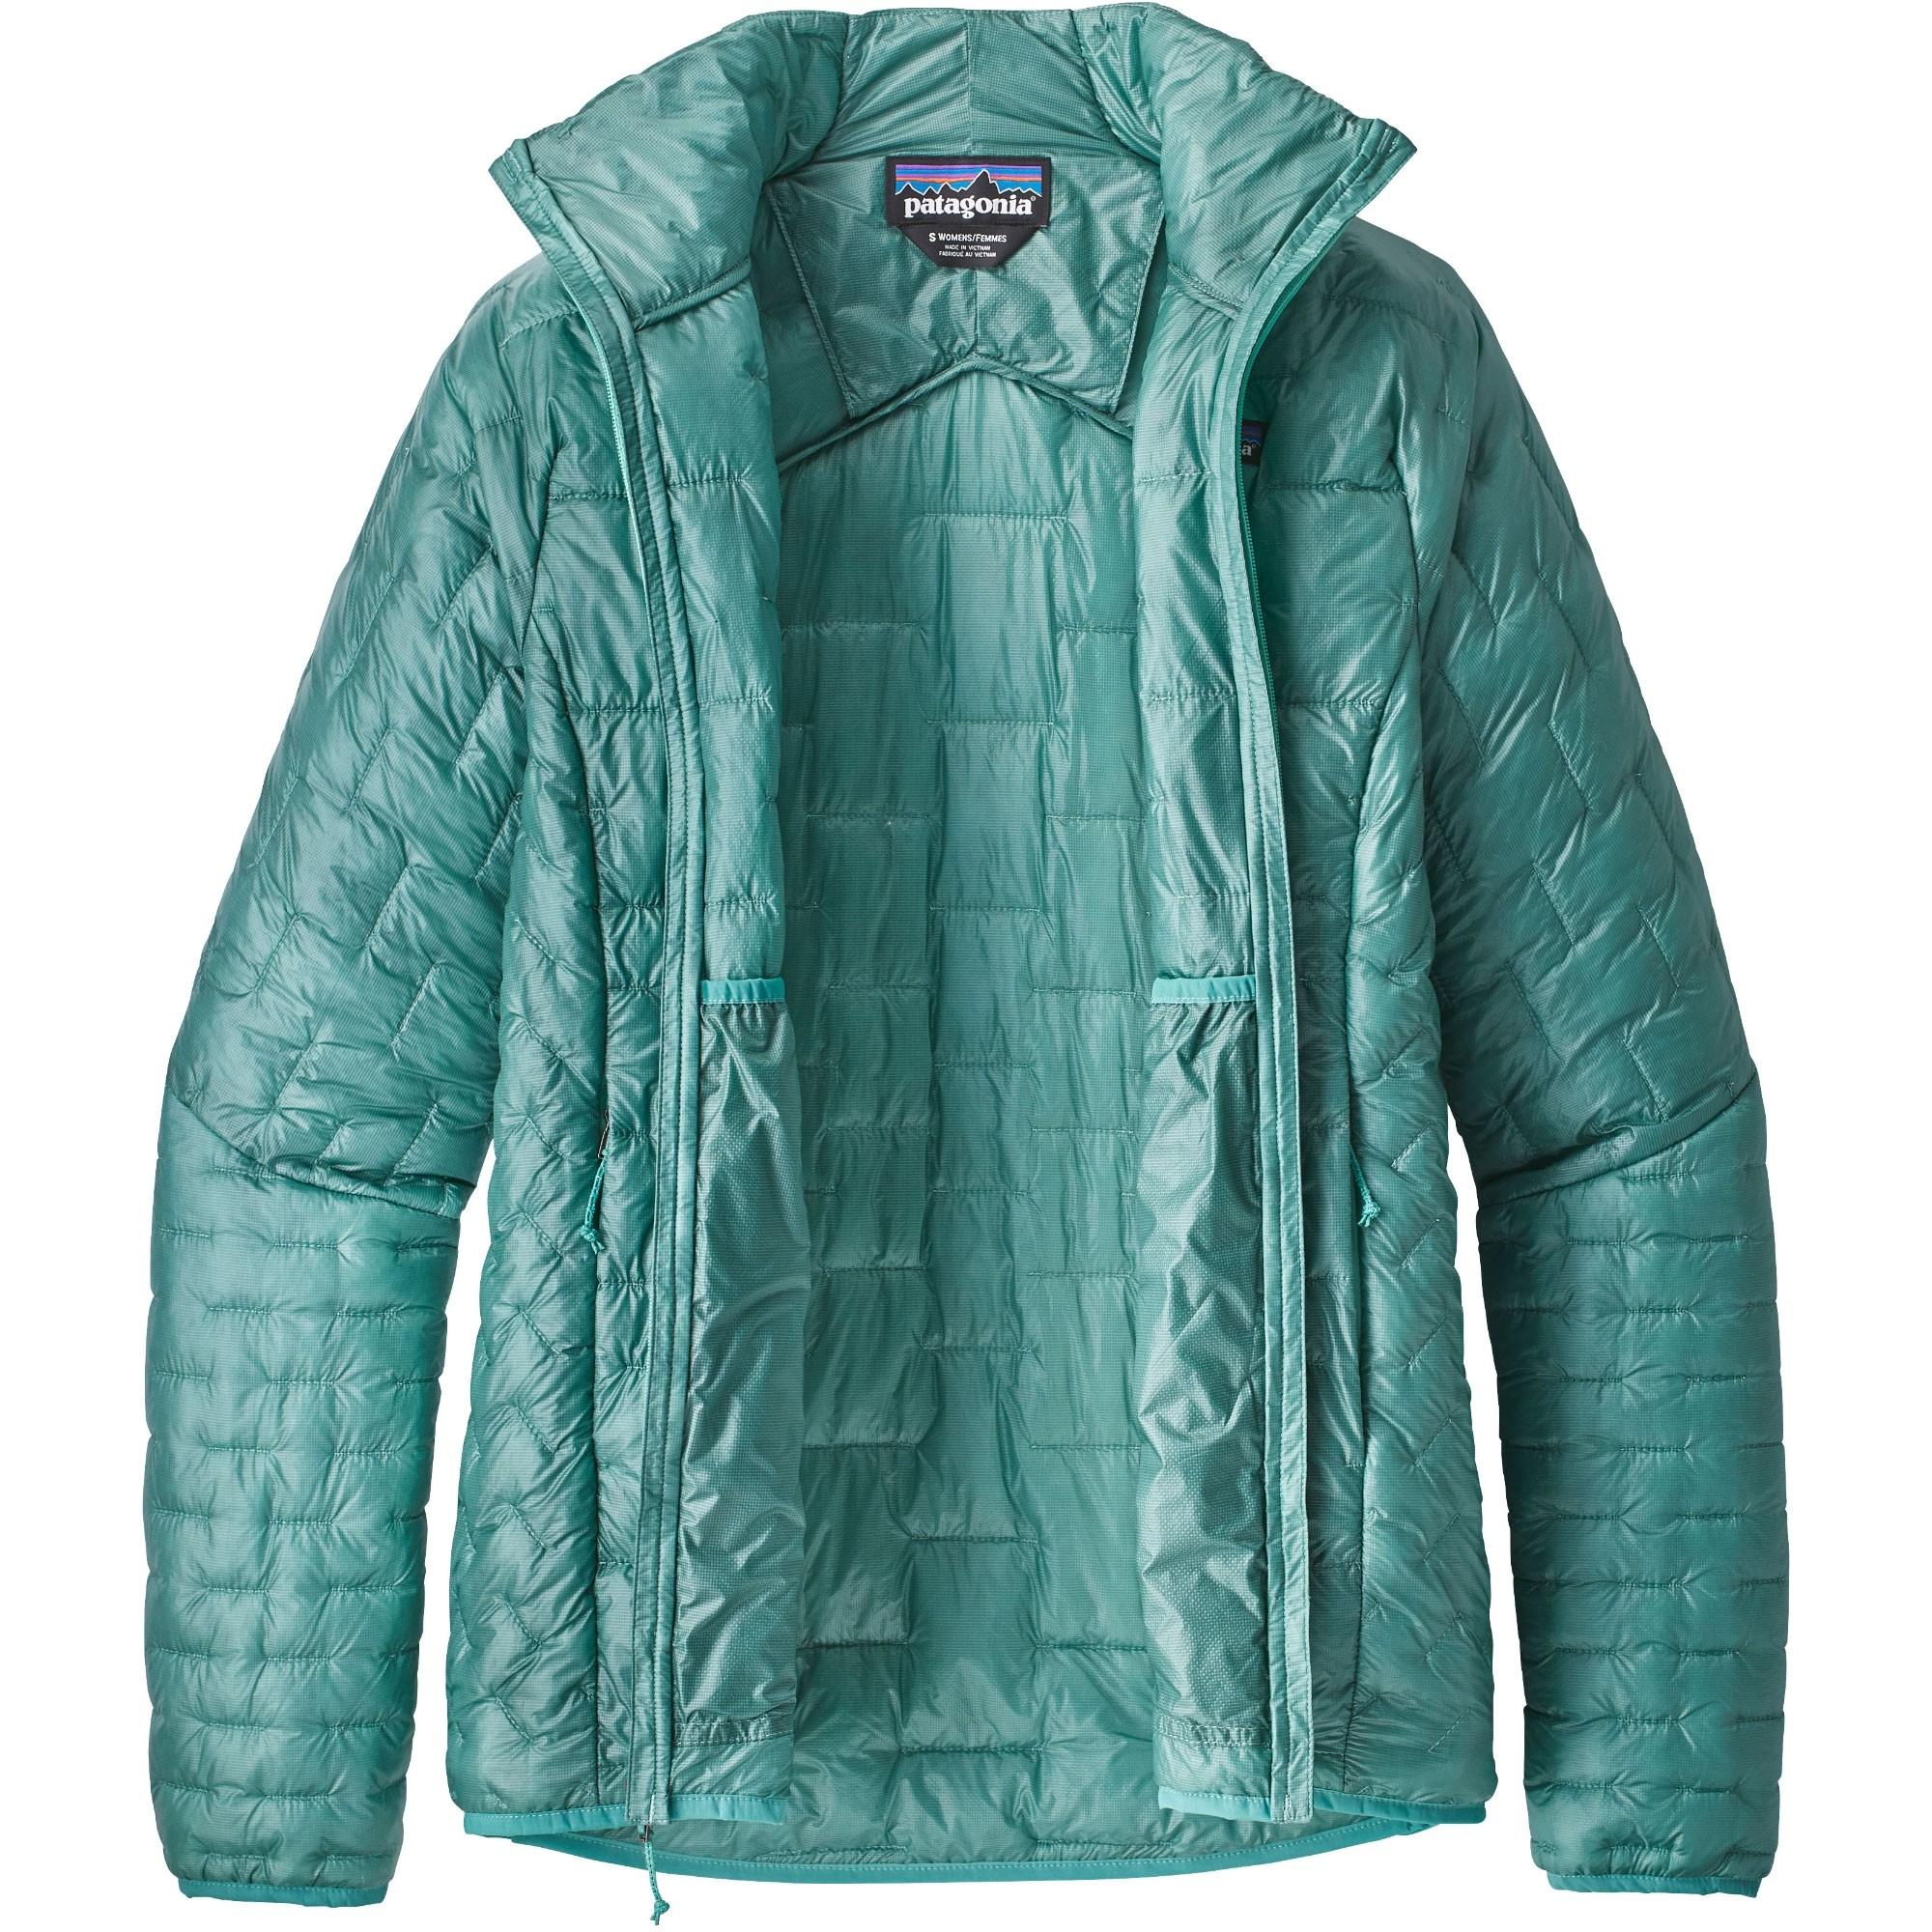 Patagonia Women's Micro Puff Jacket - Beryl Green - open